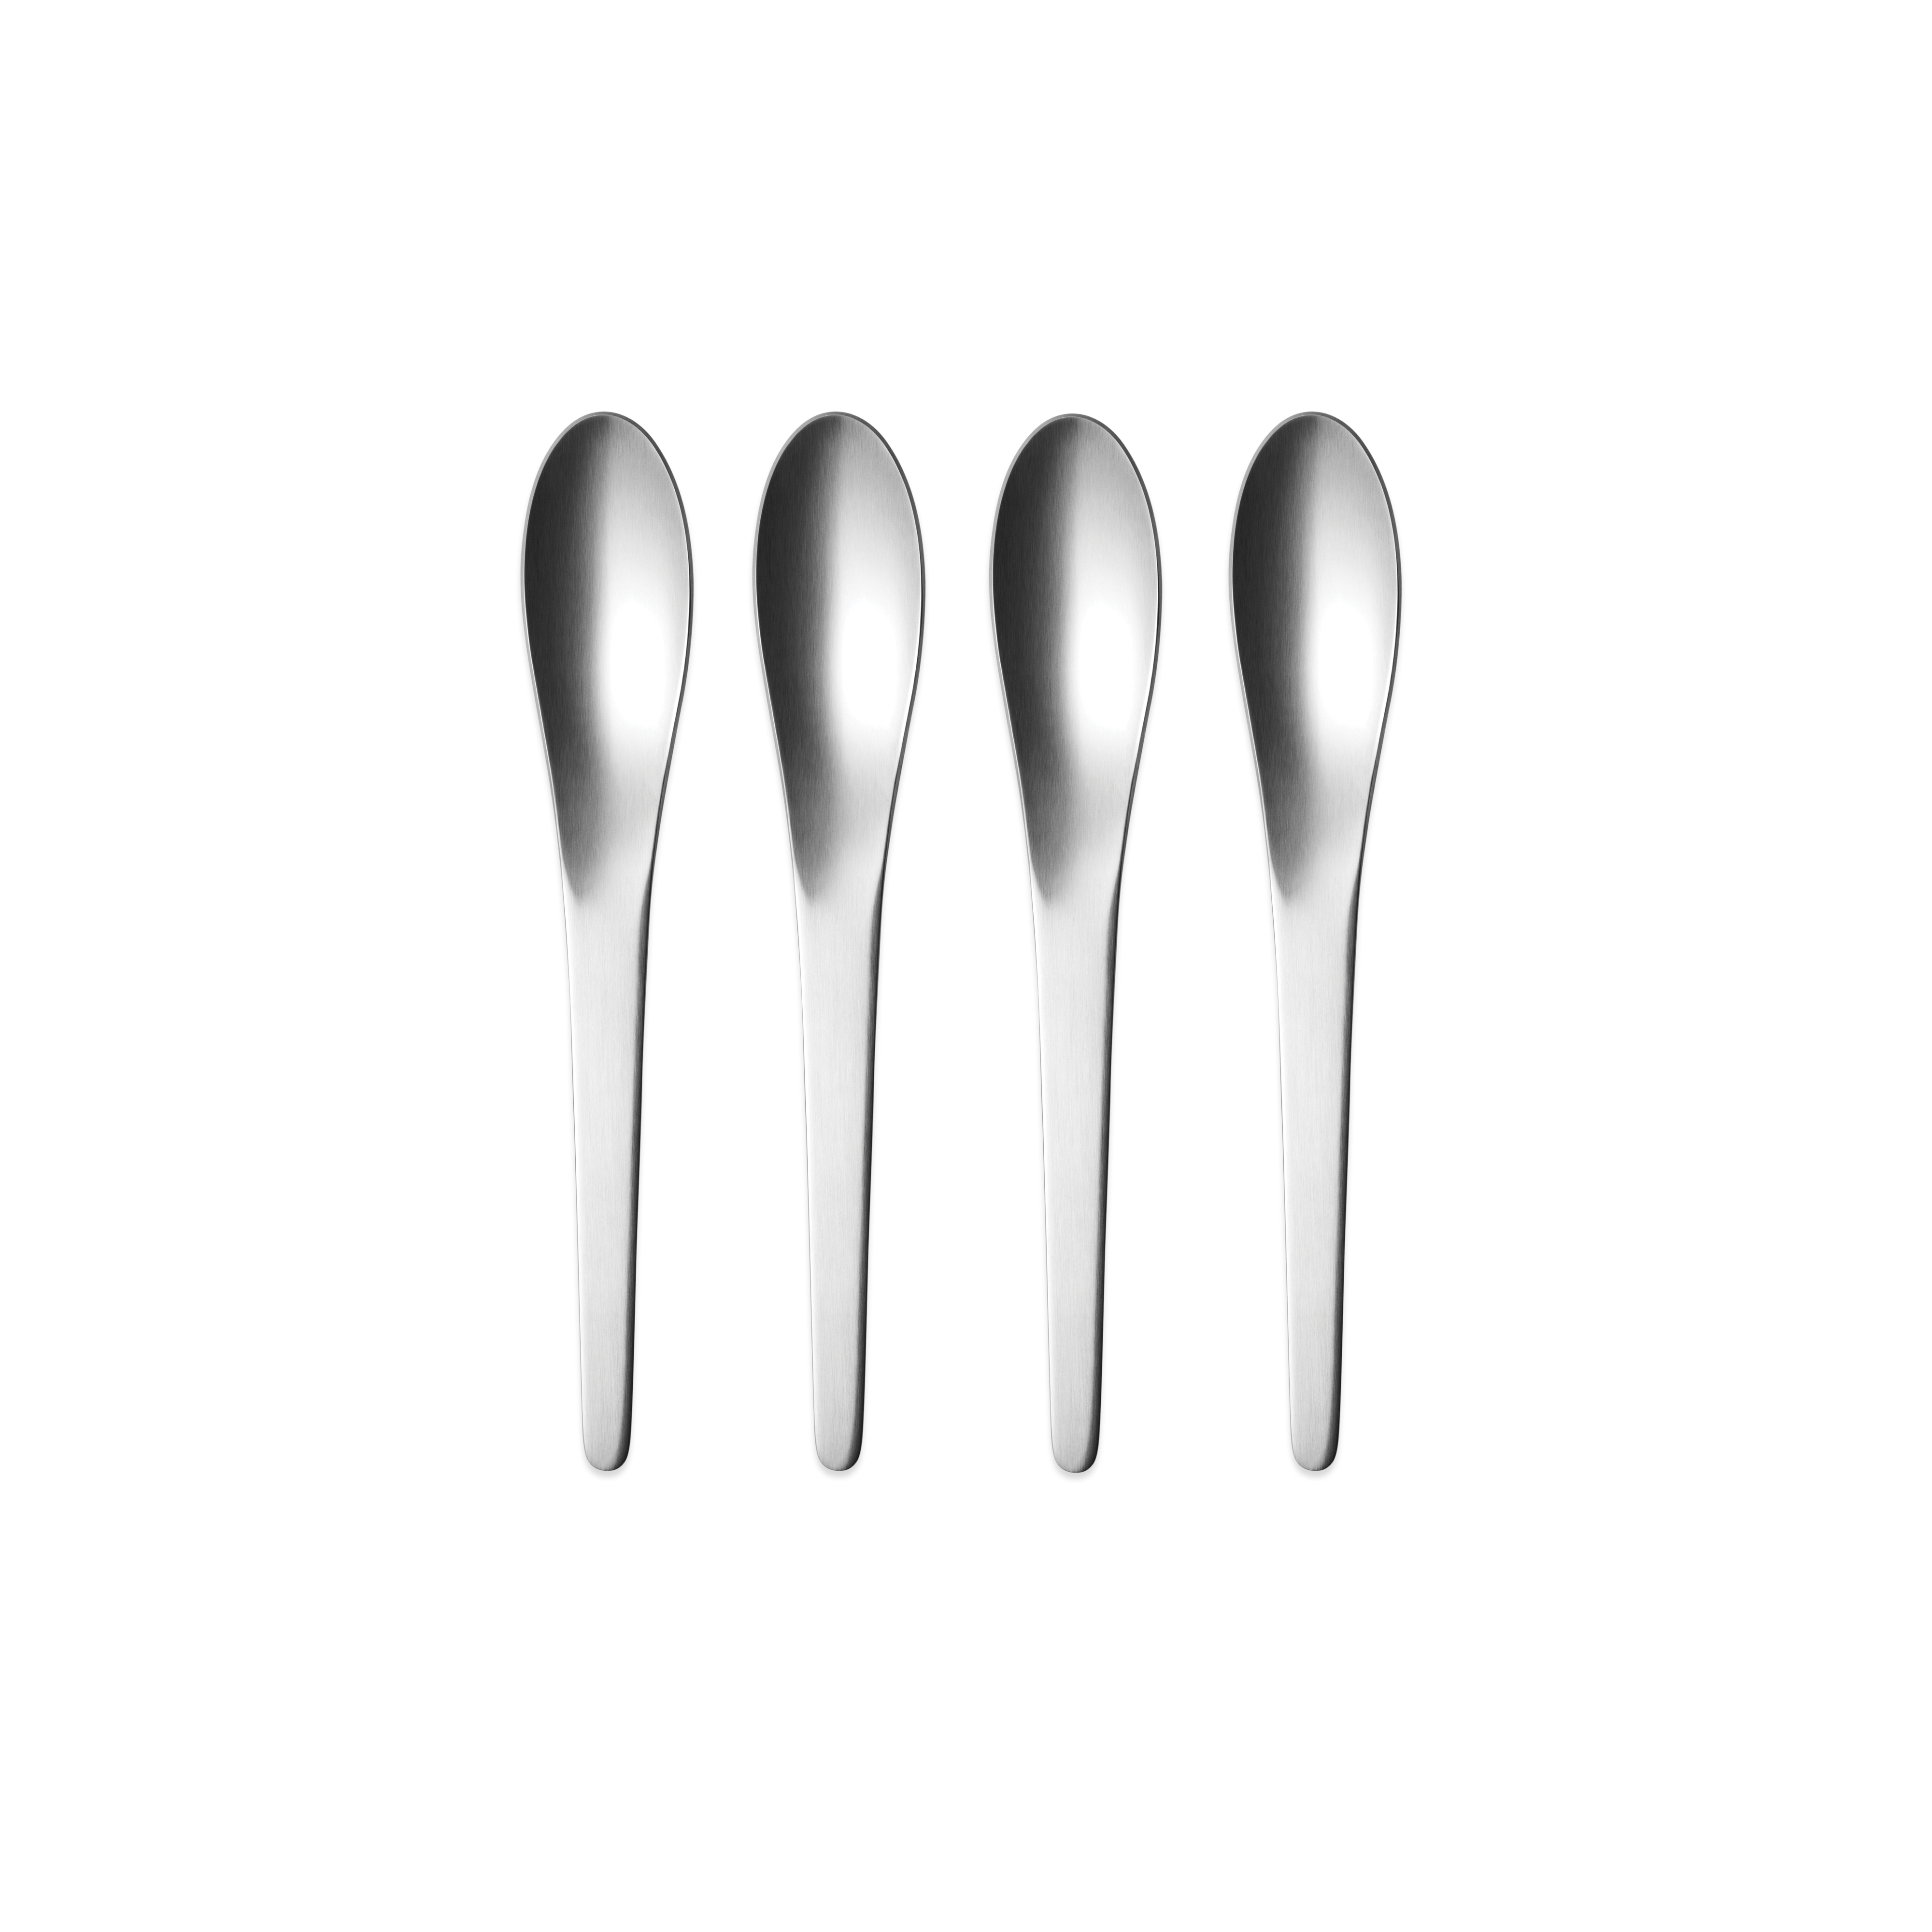 Georg Jensen Arne Jacobsen dessertske, mat, 4 stk